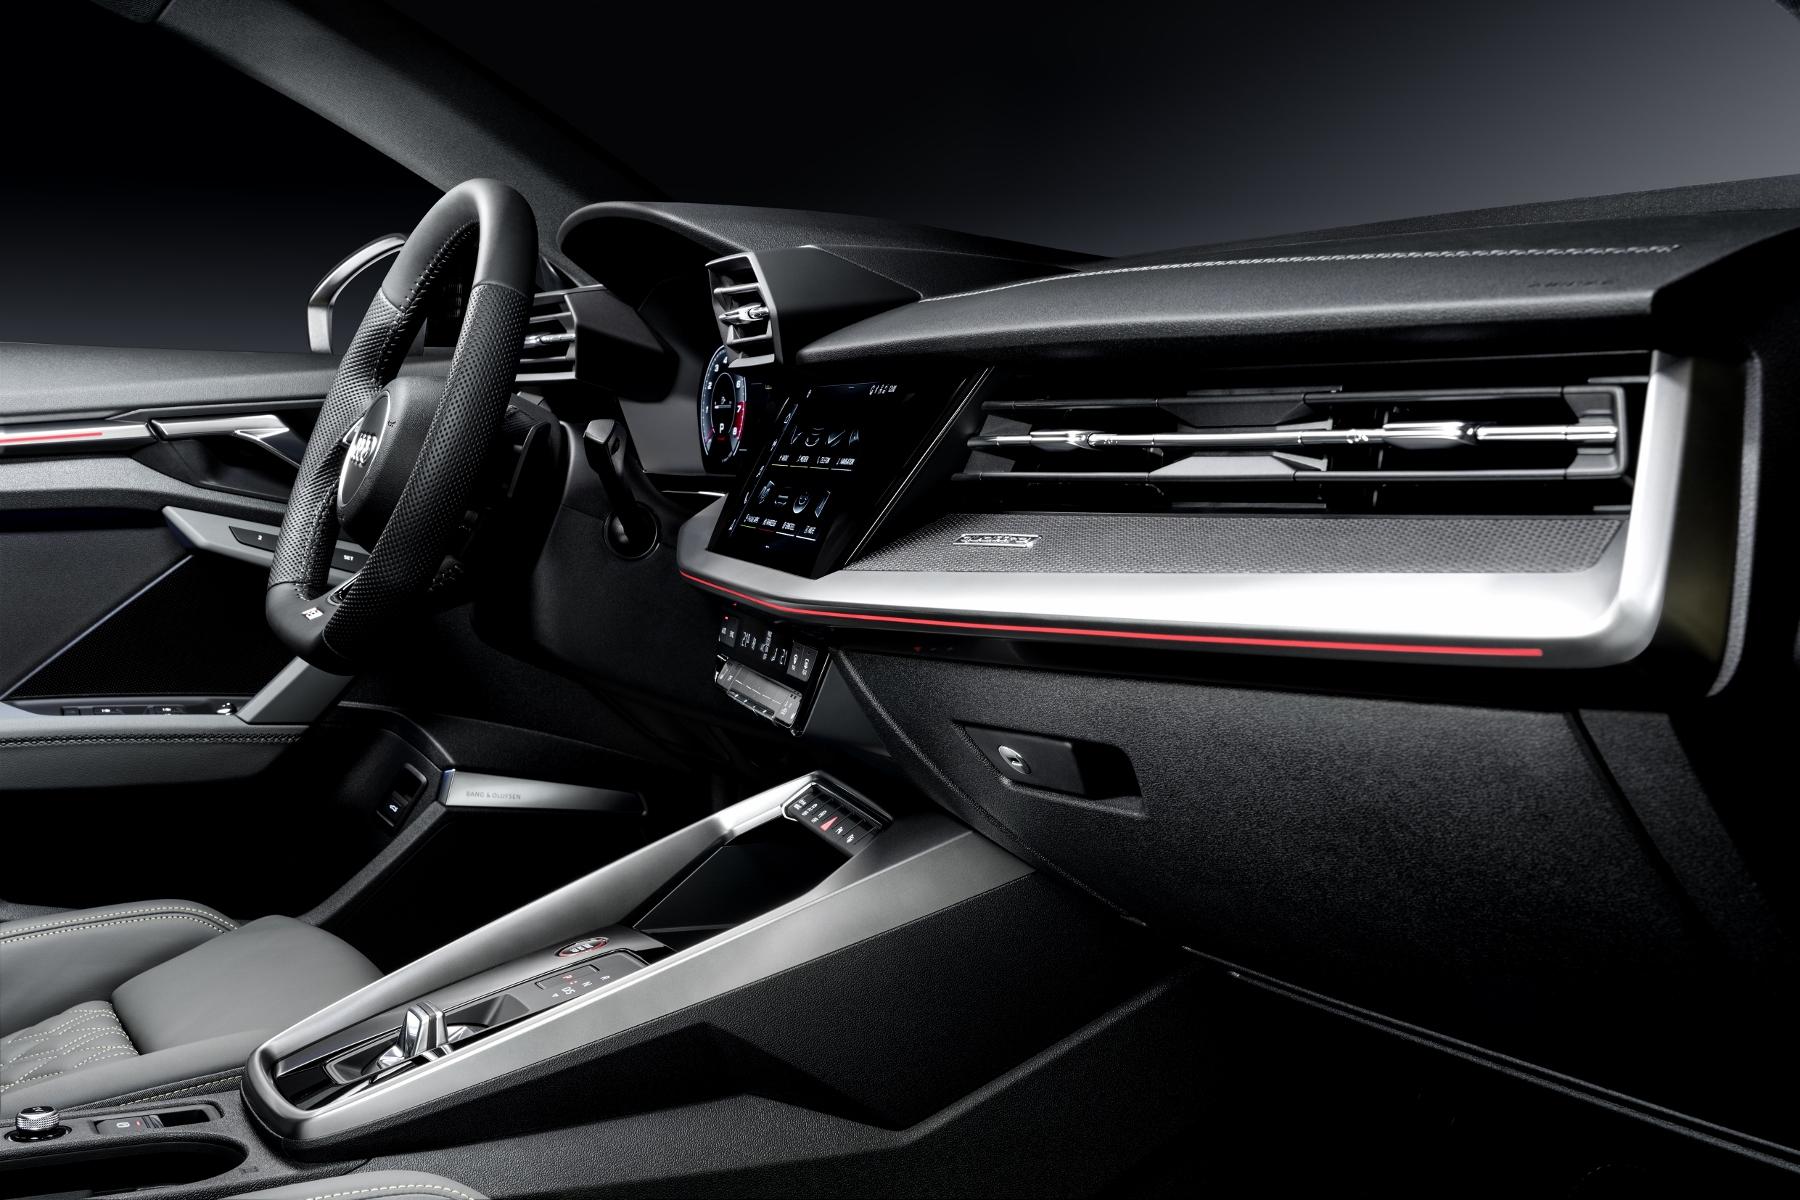 Audi ukázalo modely S3 Sedan a Sportback. Prezradilo aj nemeckú cenu QT1WdDW5JM a204423large-1800x12